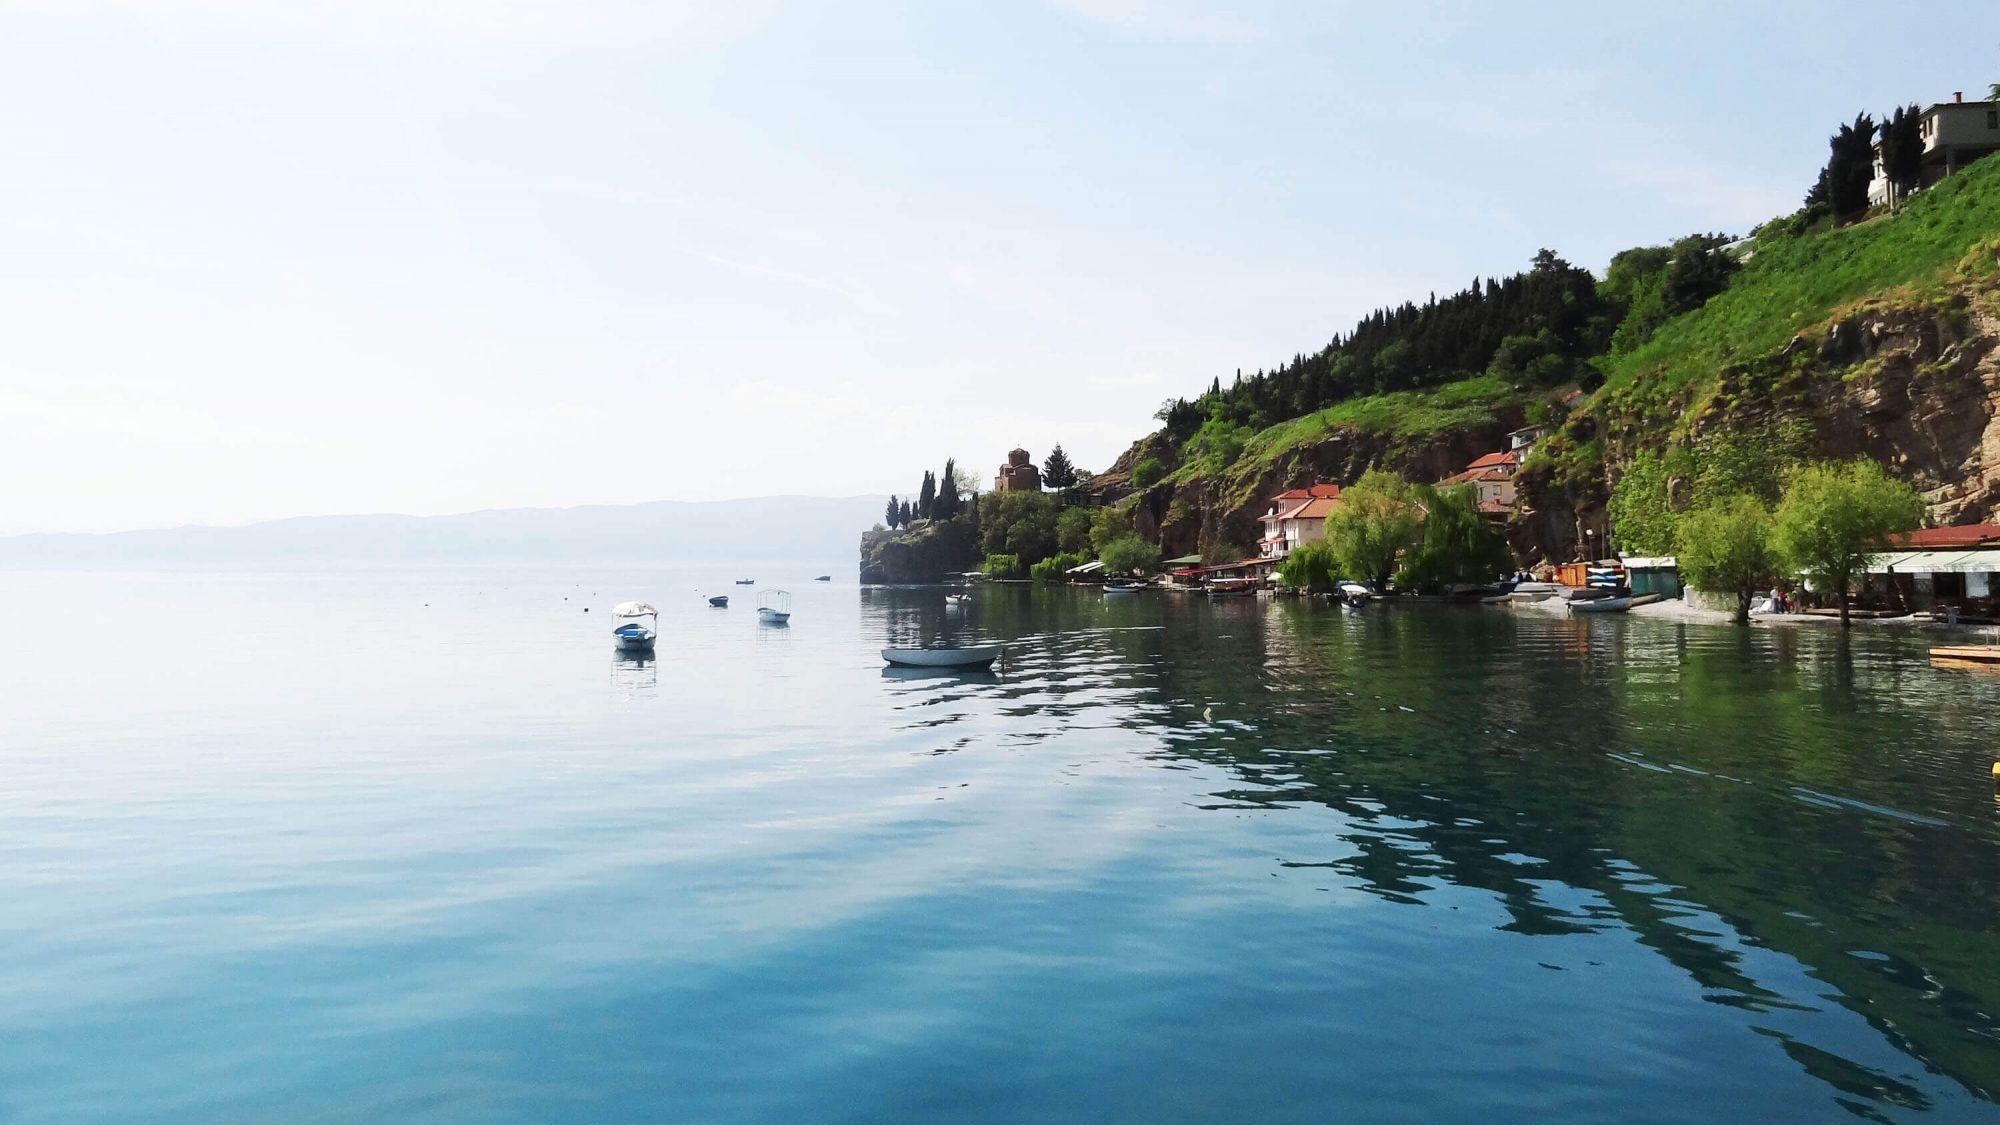 Ohri Gezi Rehberi Makedonya | Ohri Gezi Rehberi Makedonya Ohri Tekne Turu 2